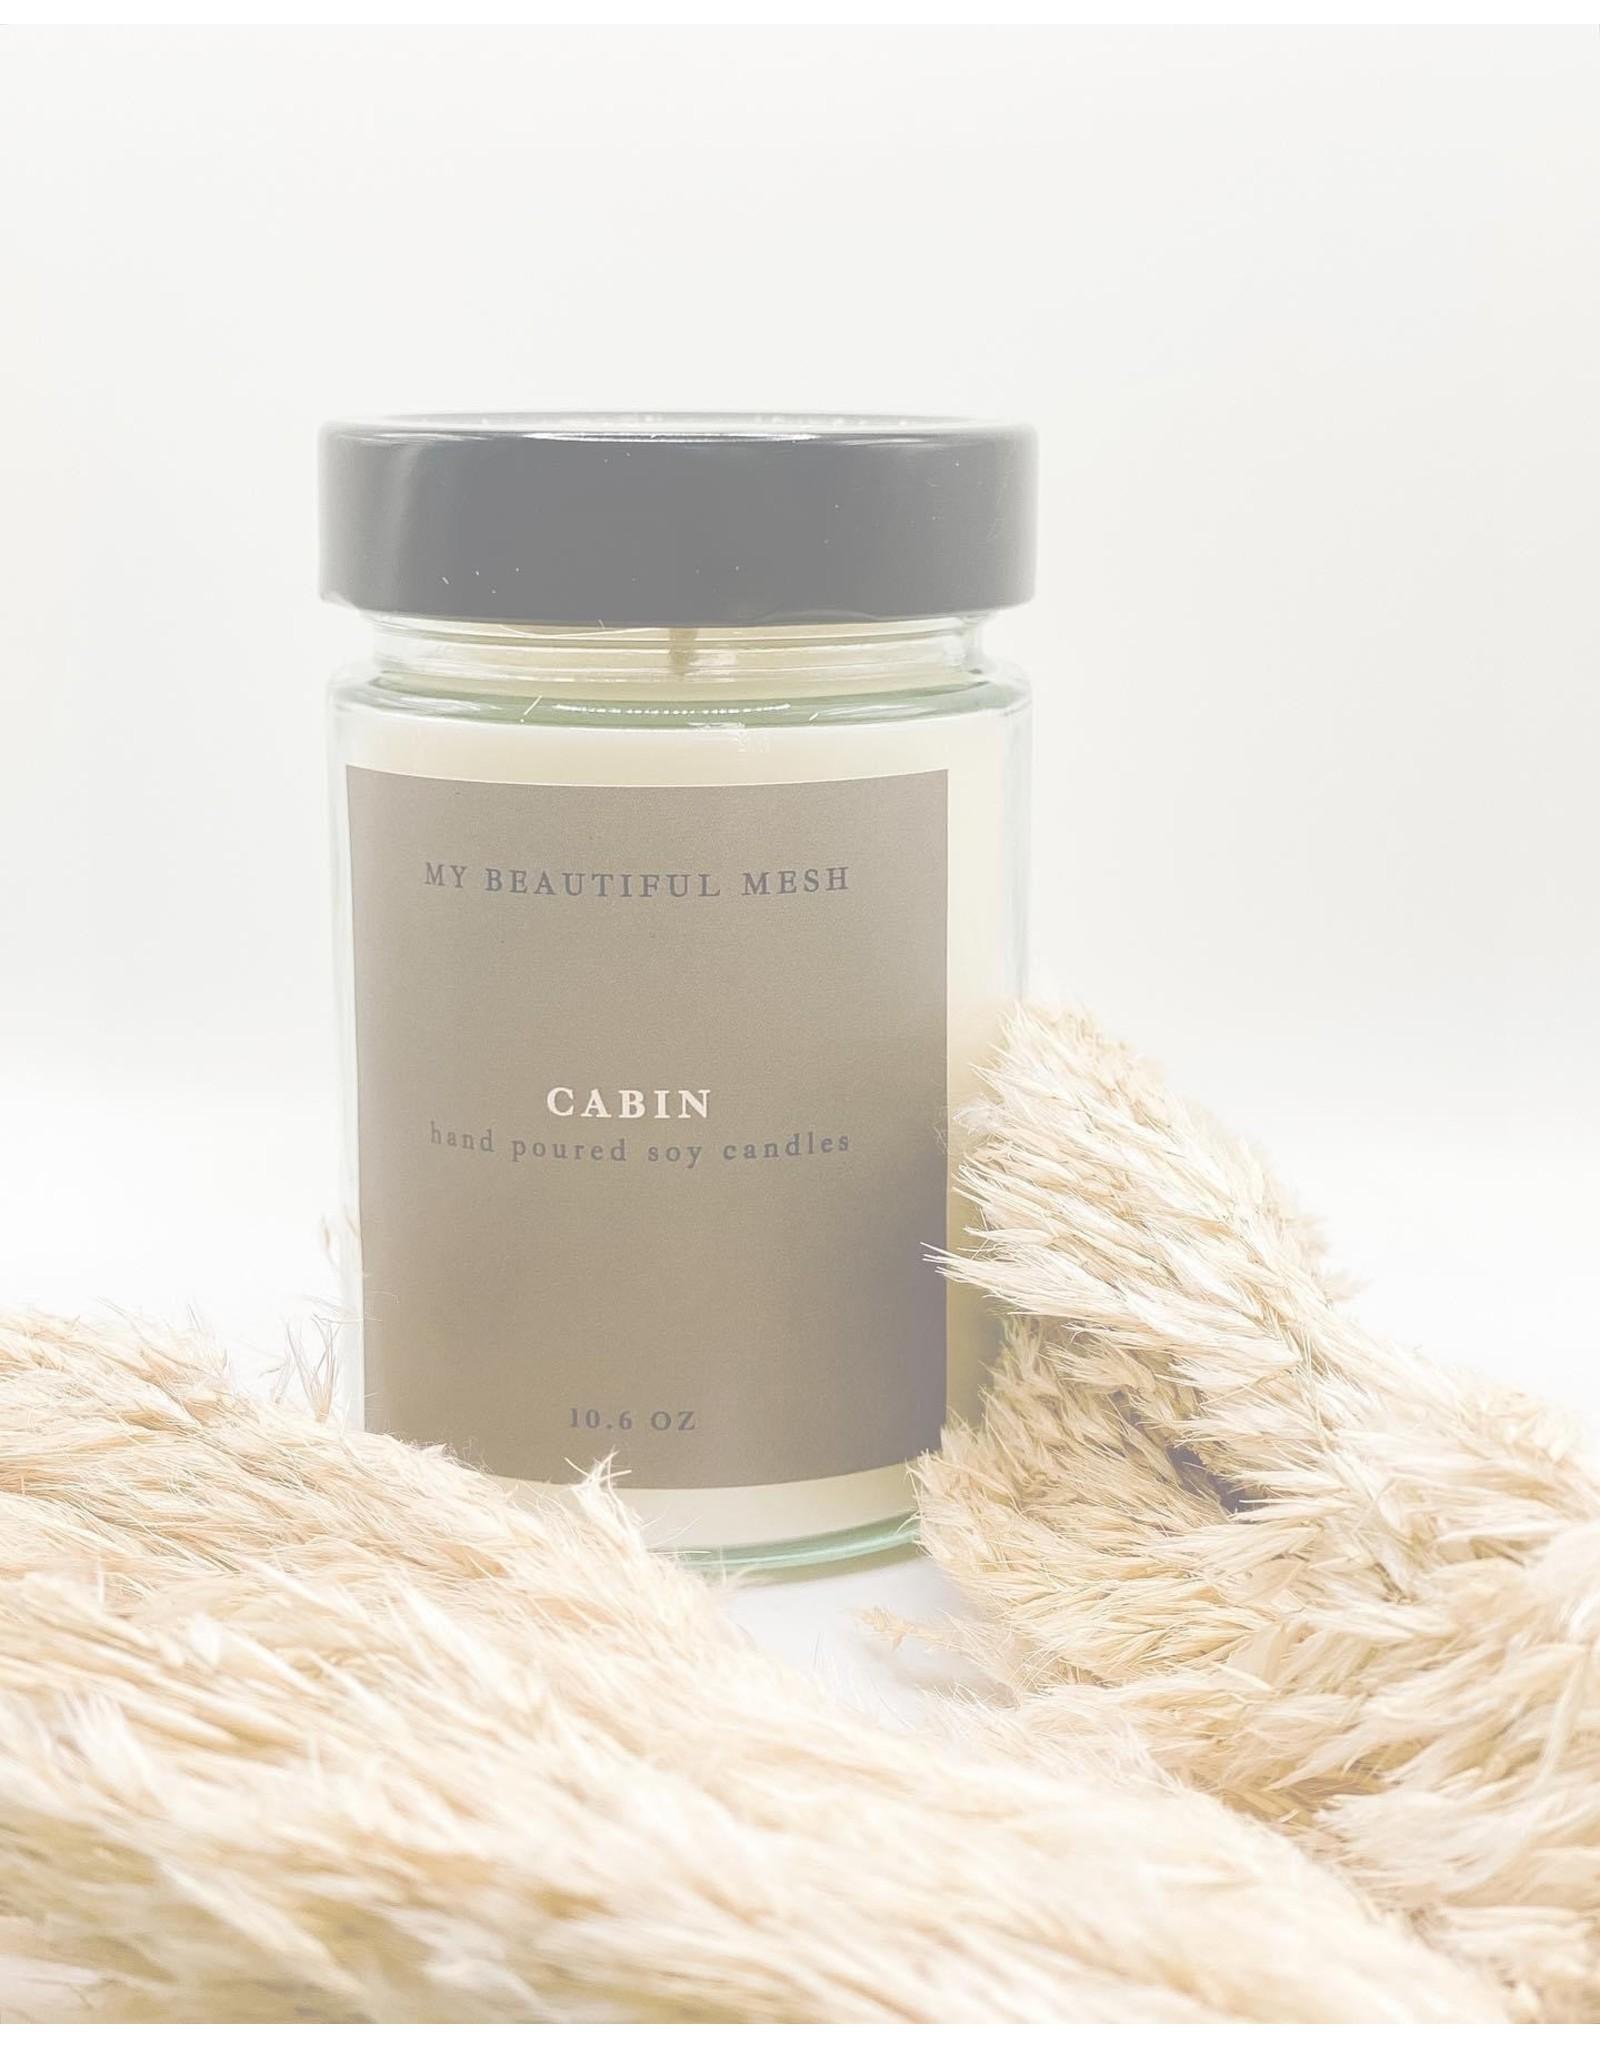 My Beautiful Mesh Cabin Candle, 10.6oz